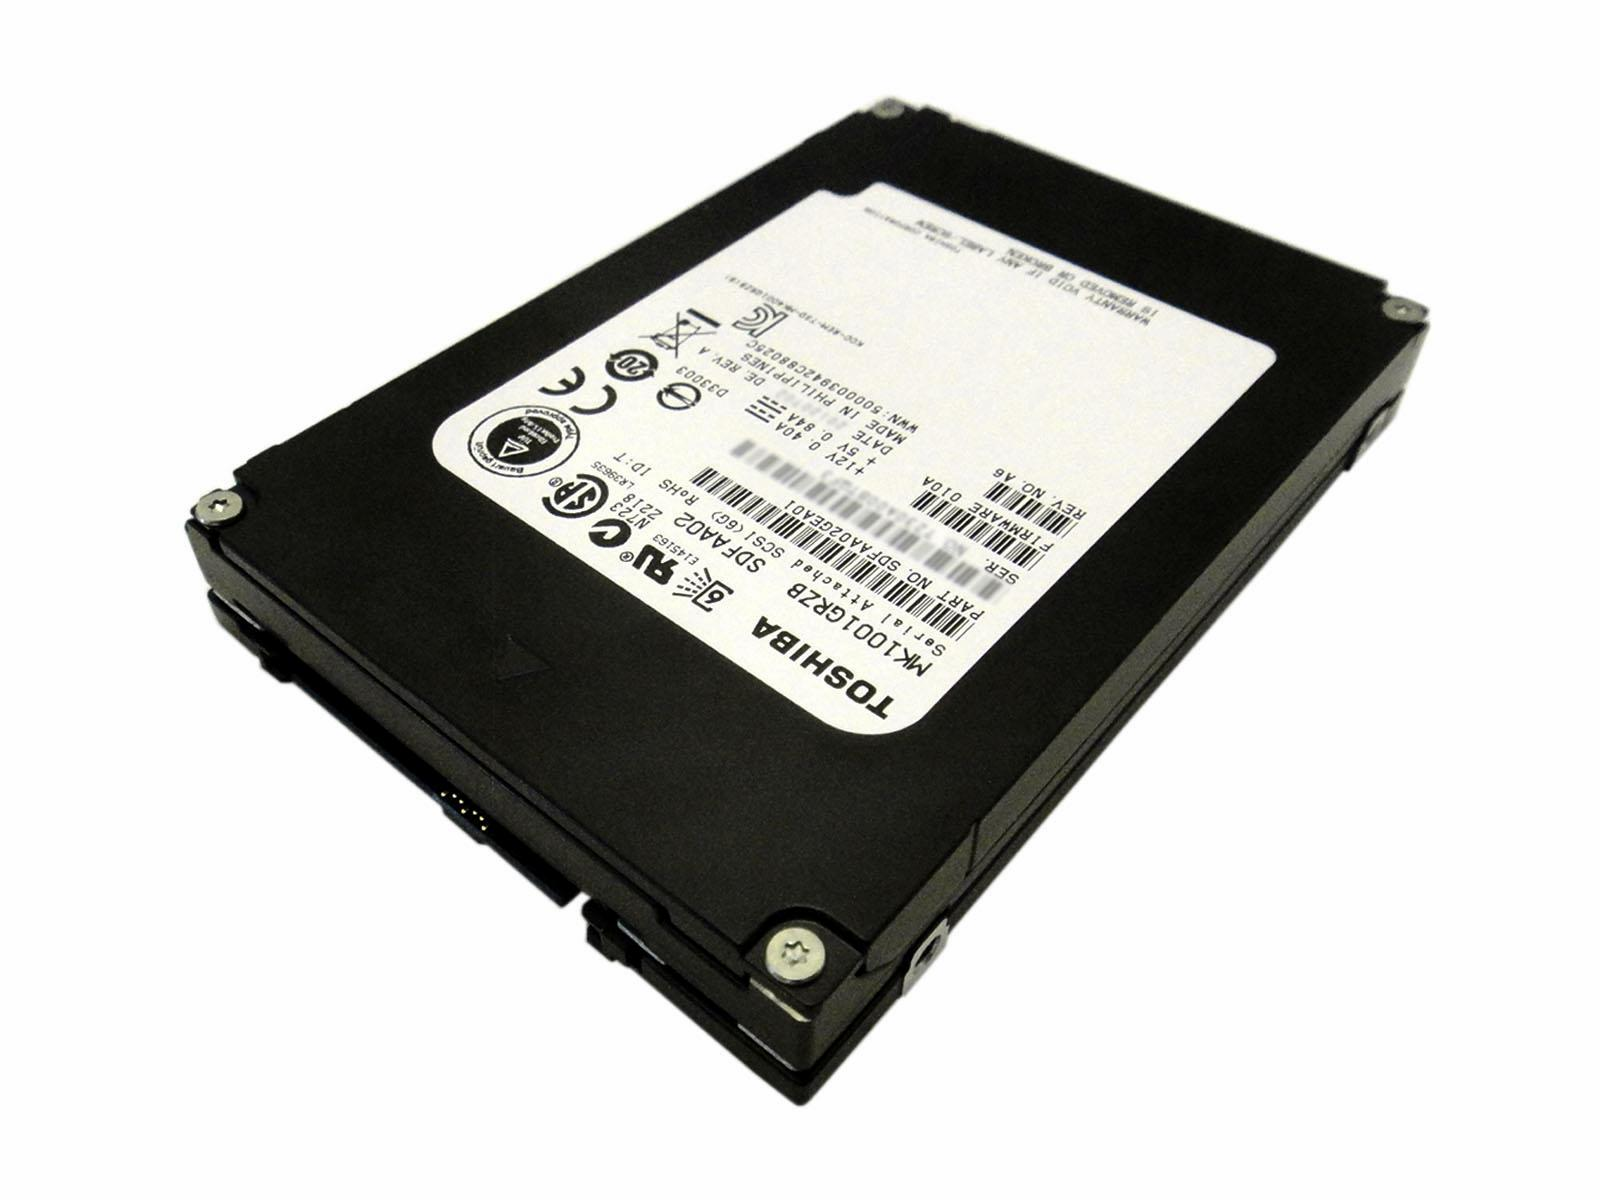 Toshiba Enterprise Phoenix-S1 MK1001GRZB SDFAA02 2 5″ SAS